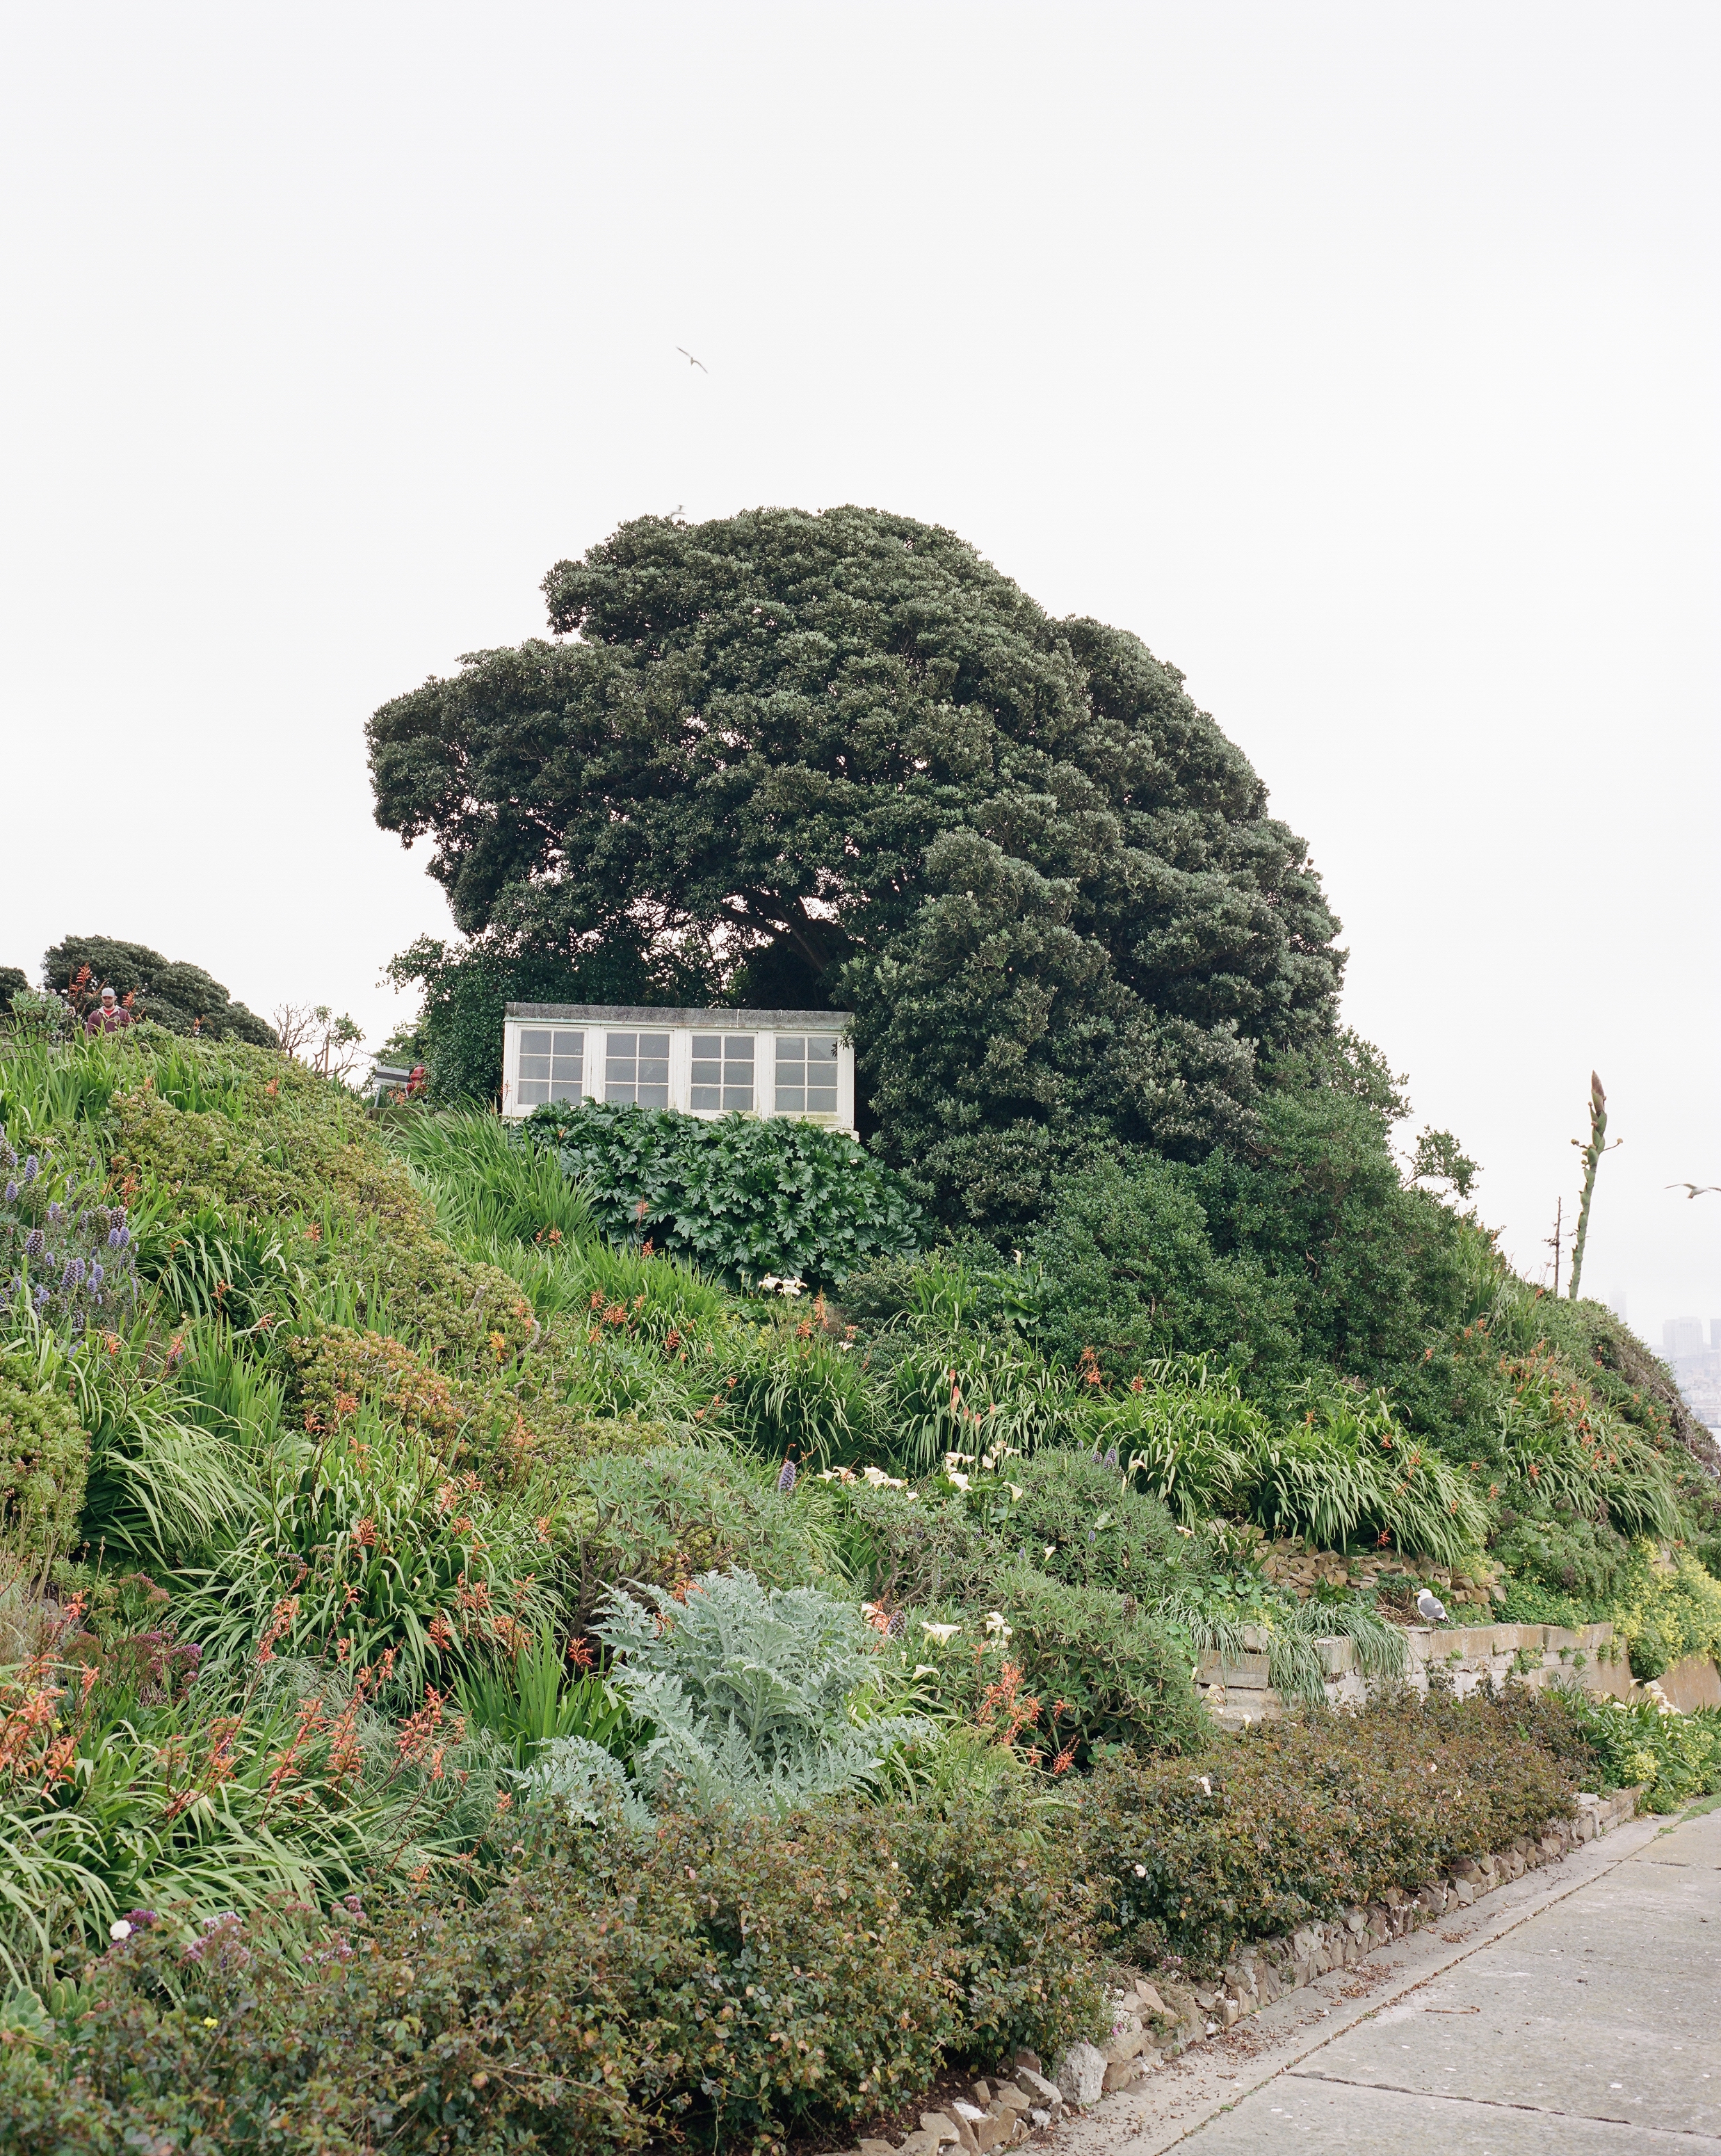 Frame 4  Little garden house on Alcatraz Island